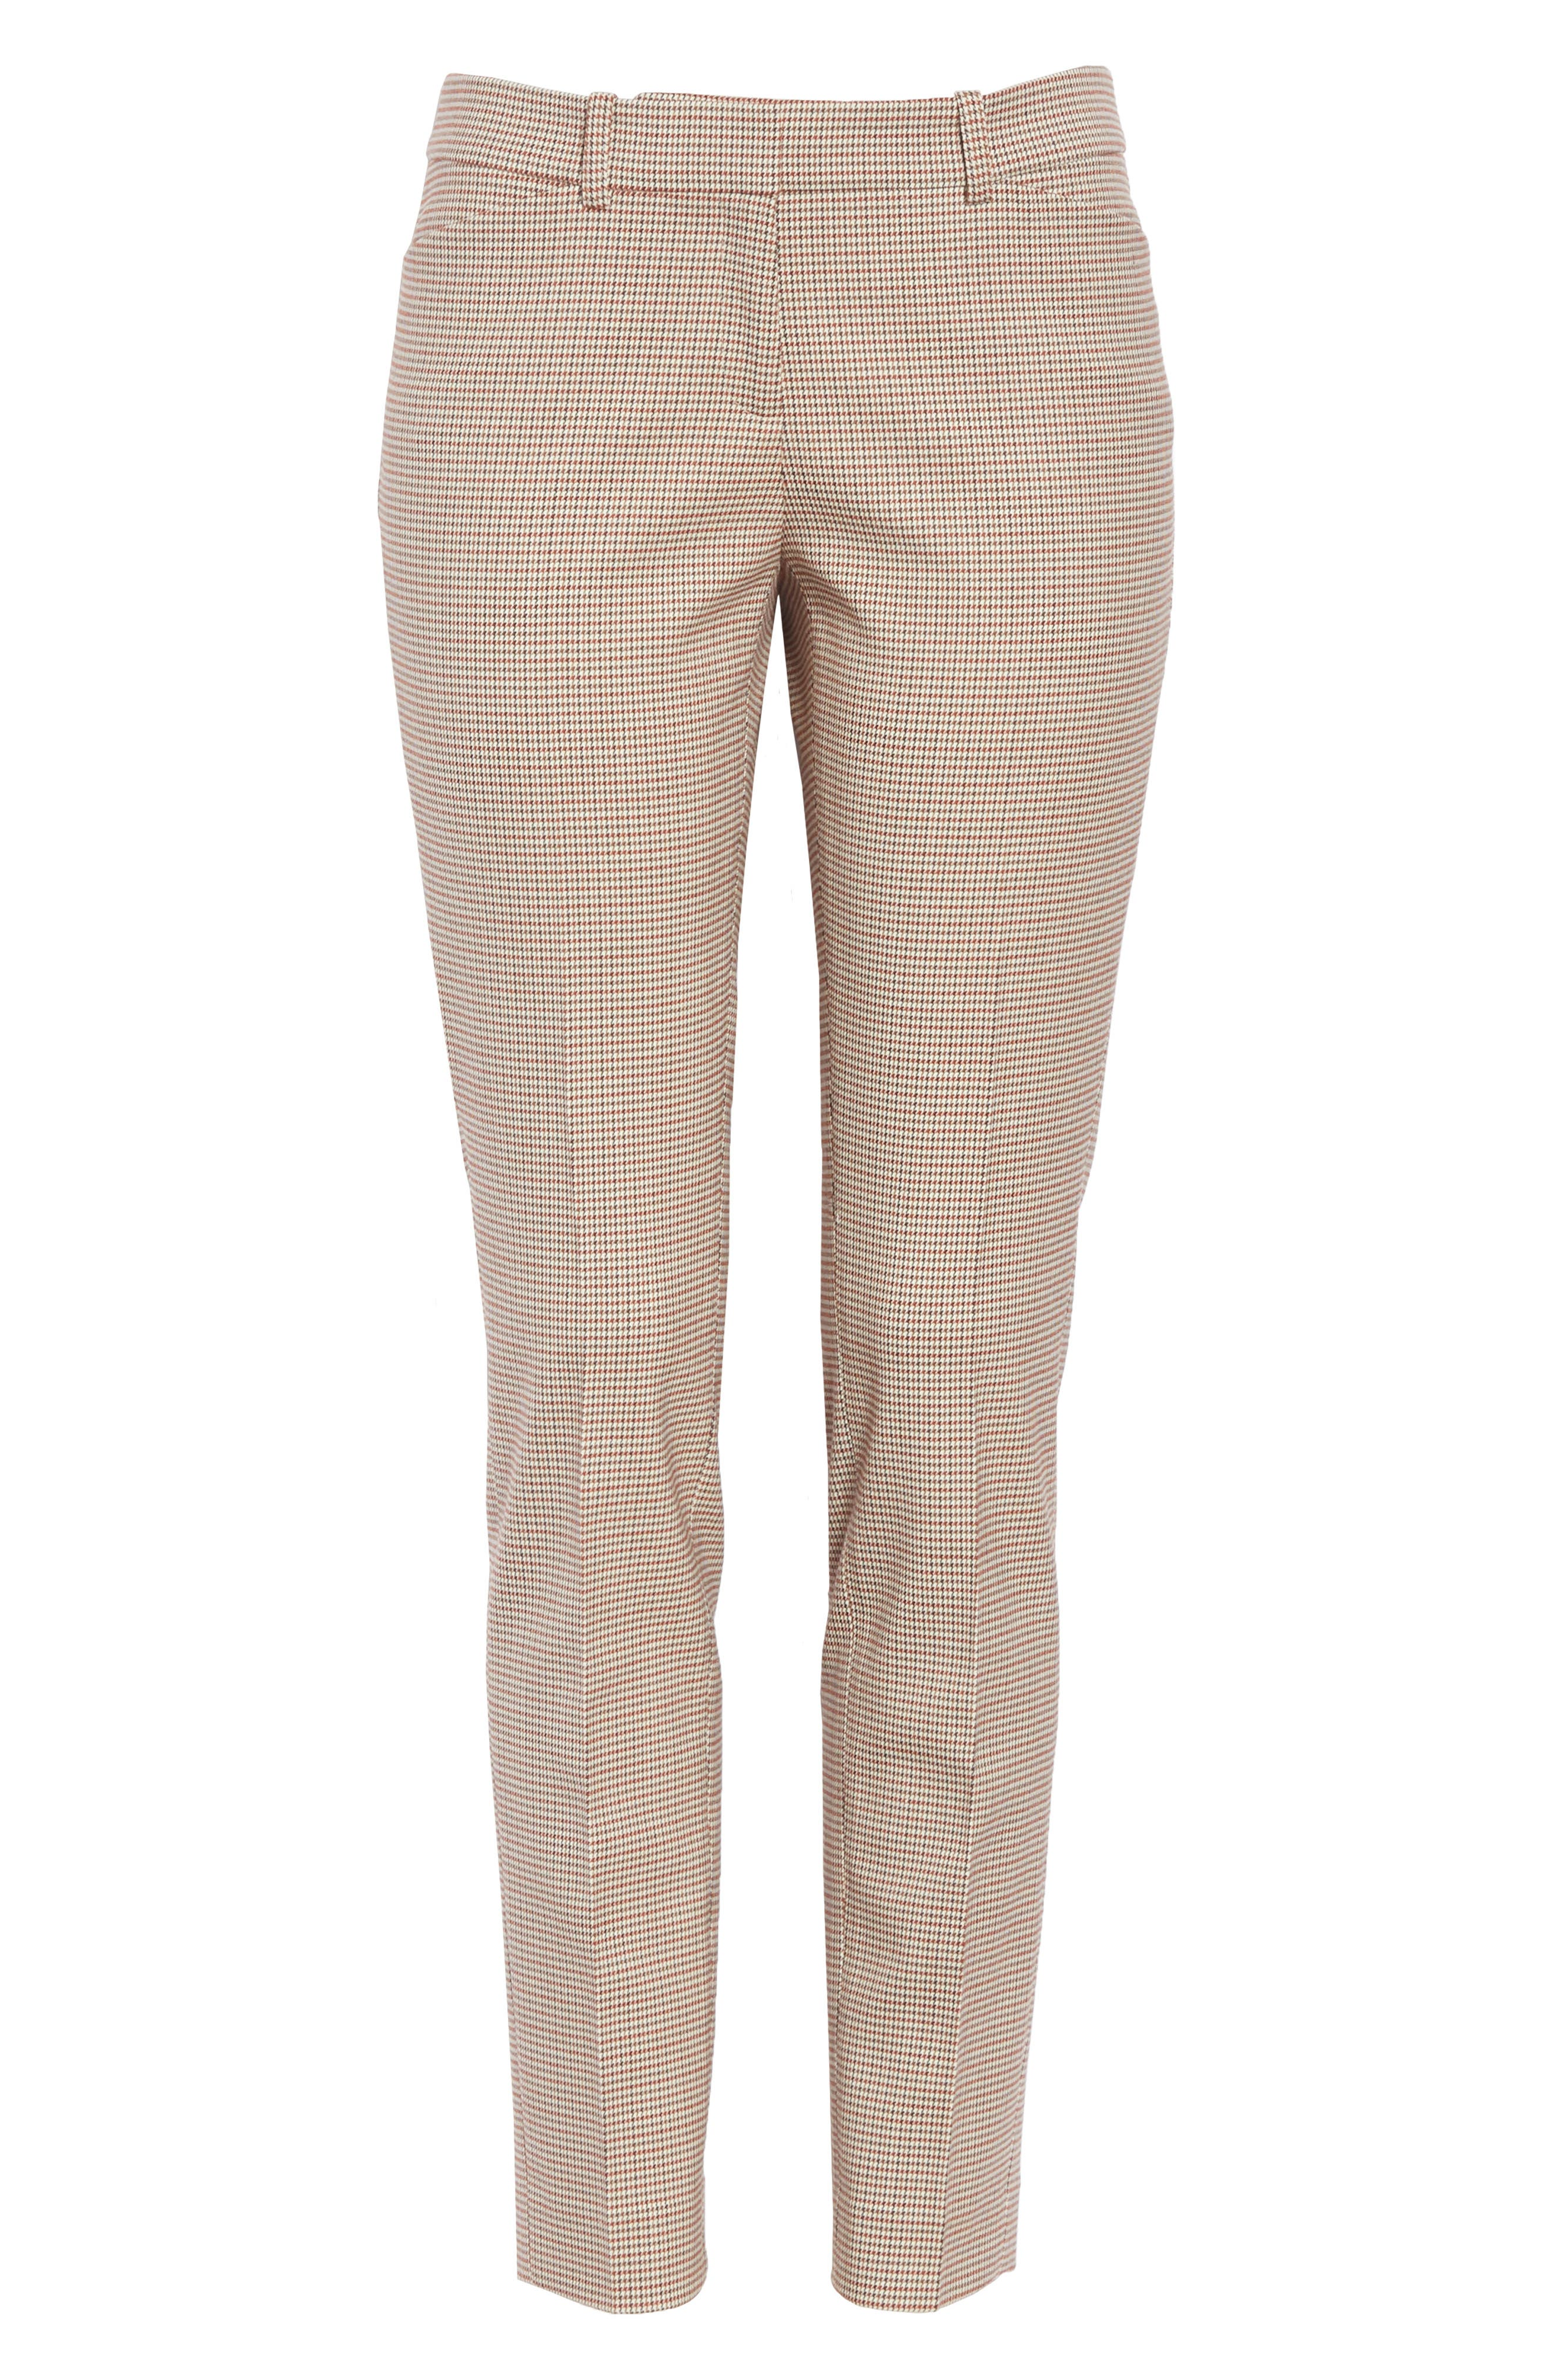 Manhattan Houndstooth Wool Blend Skinny Pants,                             Alternate thumbnail 6, color,                             SAFFRON MULTI